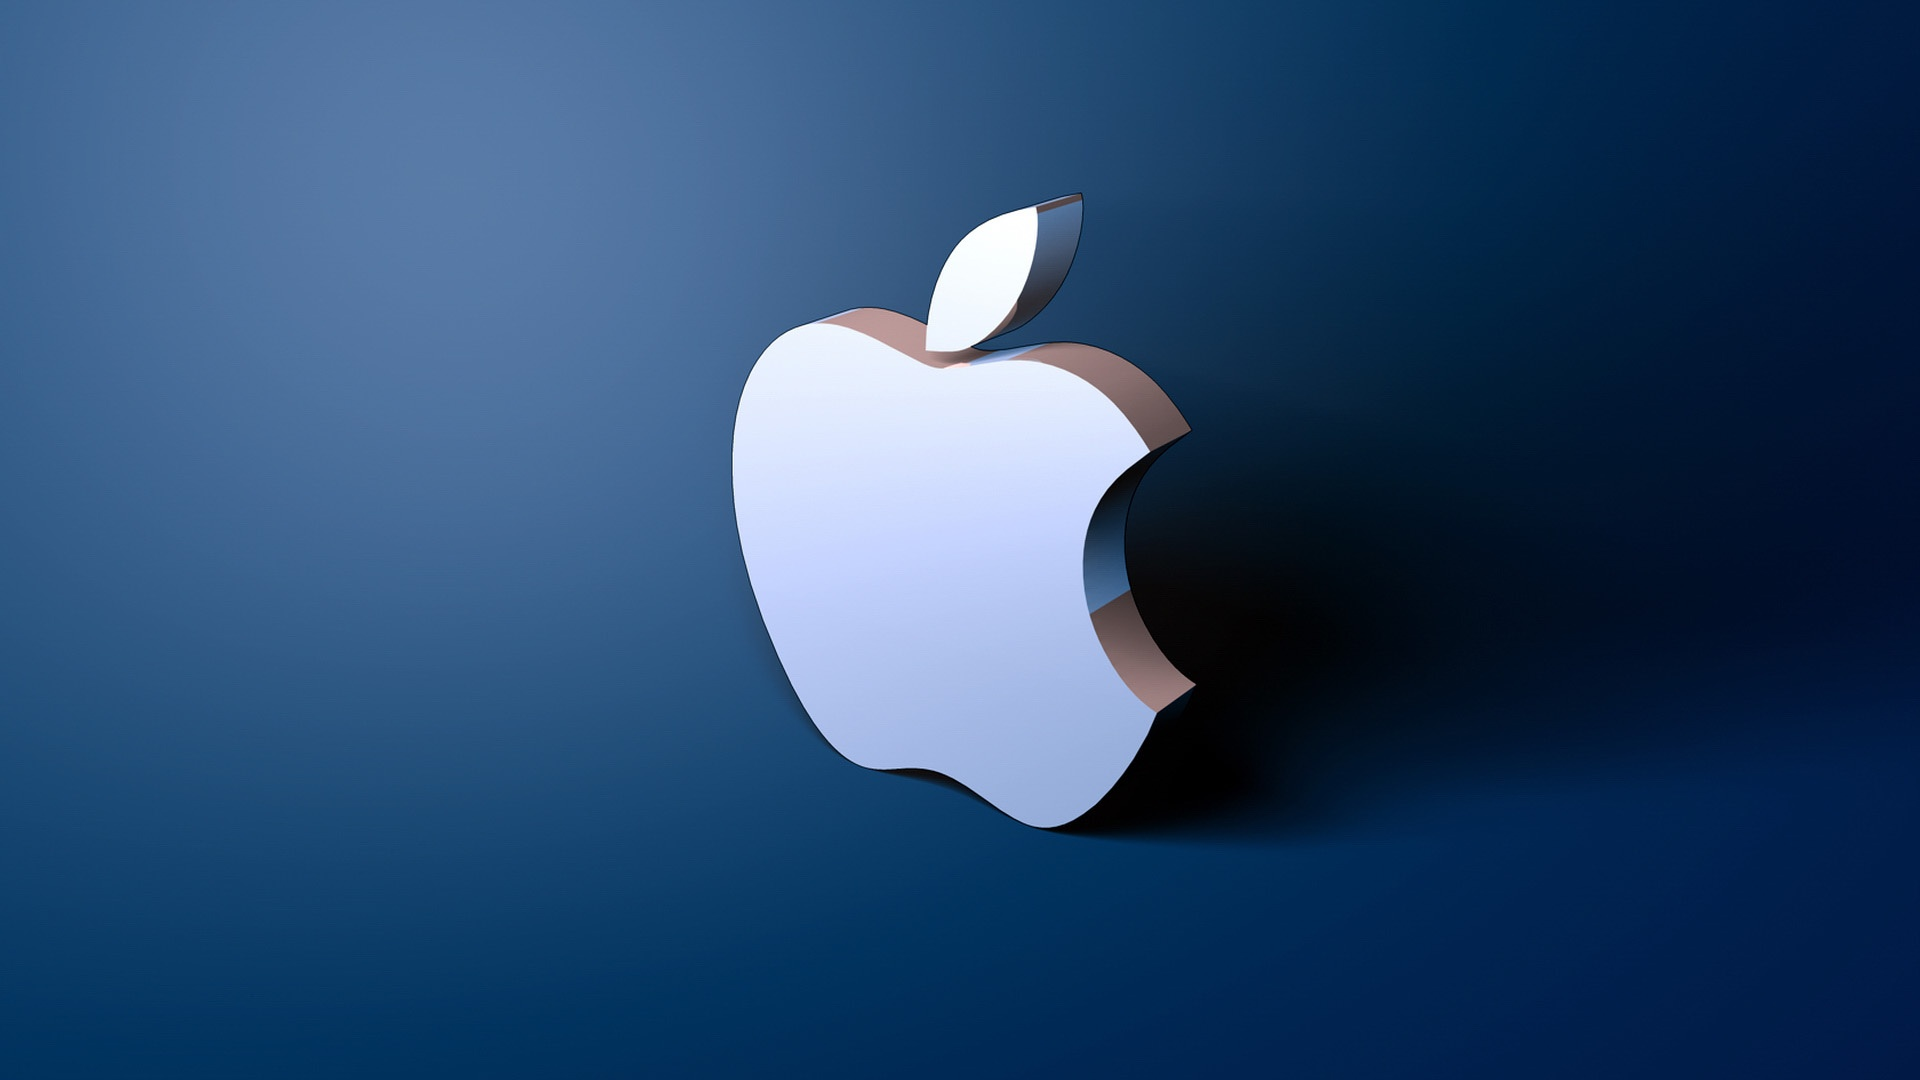 Download Apple Logo Design HD Wallpaper Download Apple Logo Design 1920x1080